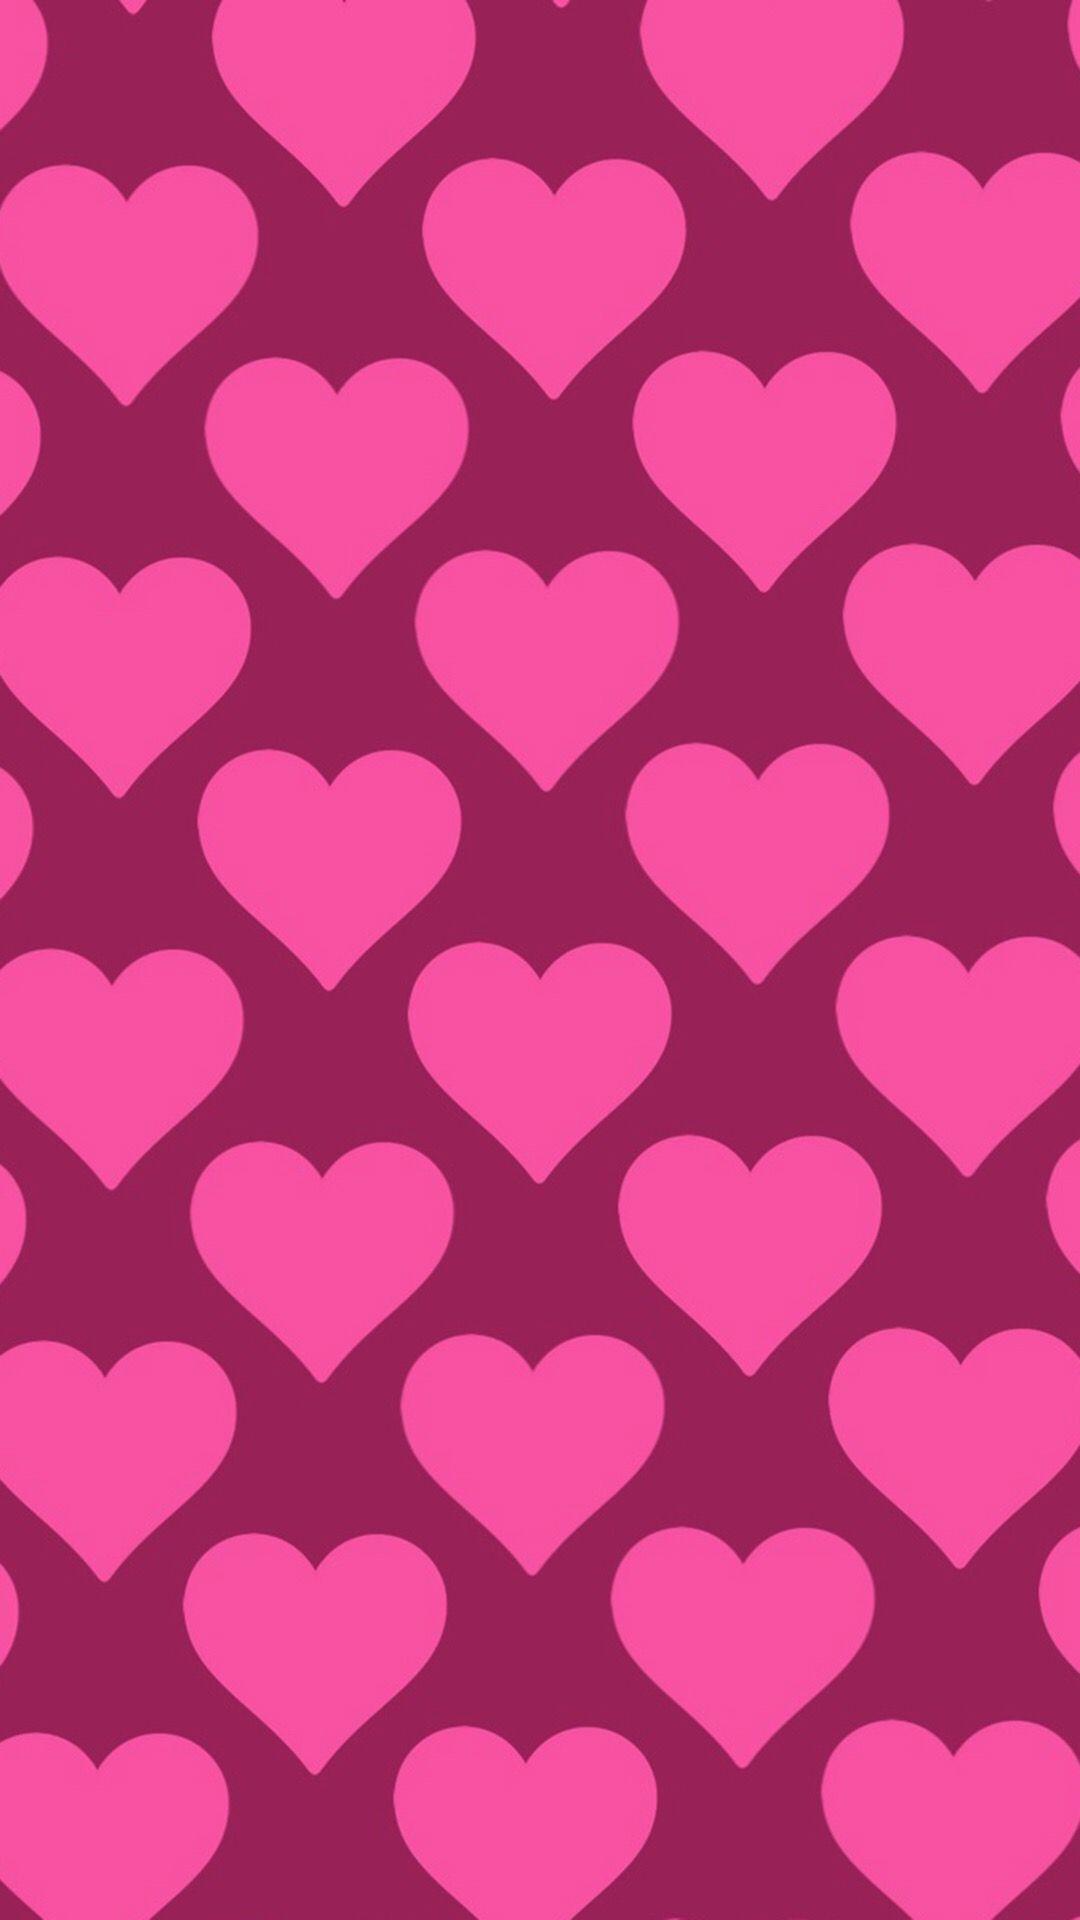 обои на телефон сердечко на розовом фоне выкройка